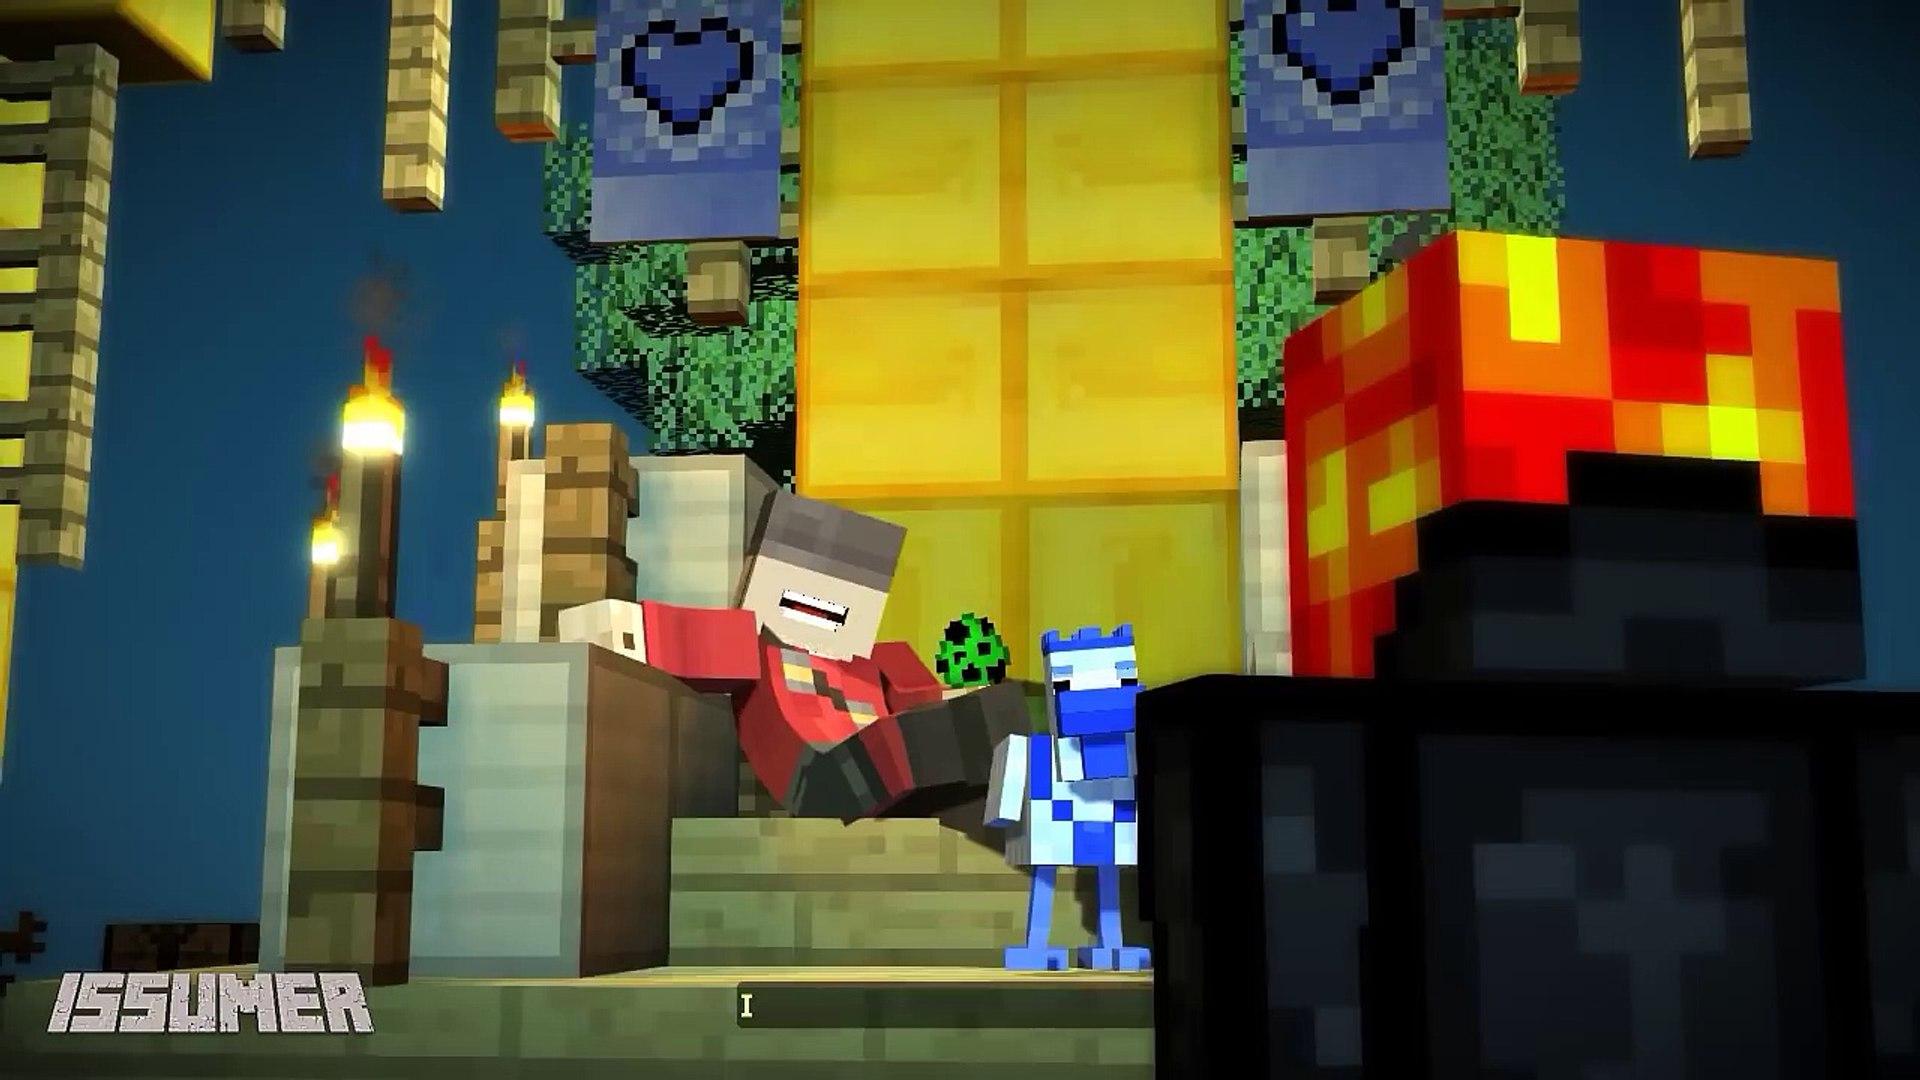 Itsjerryandharry Conflict Itsjerry Vs Itsharry Fight Minecraft